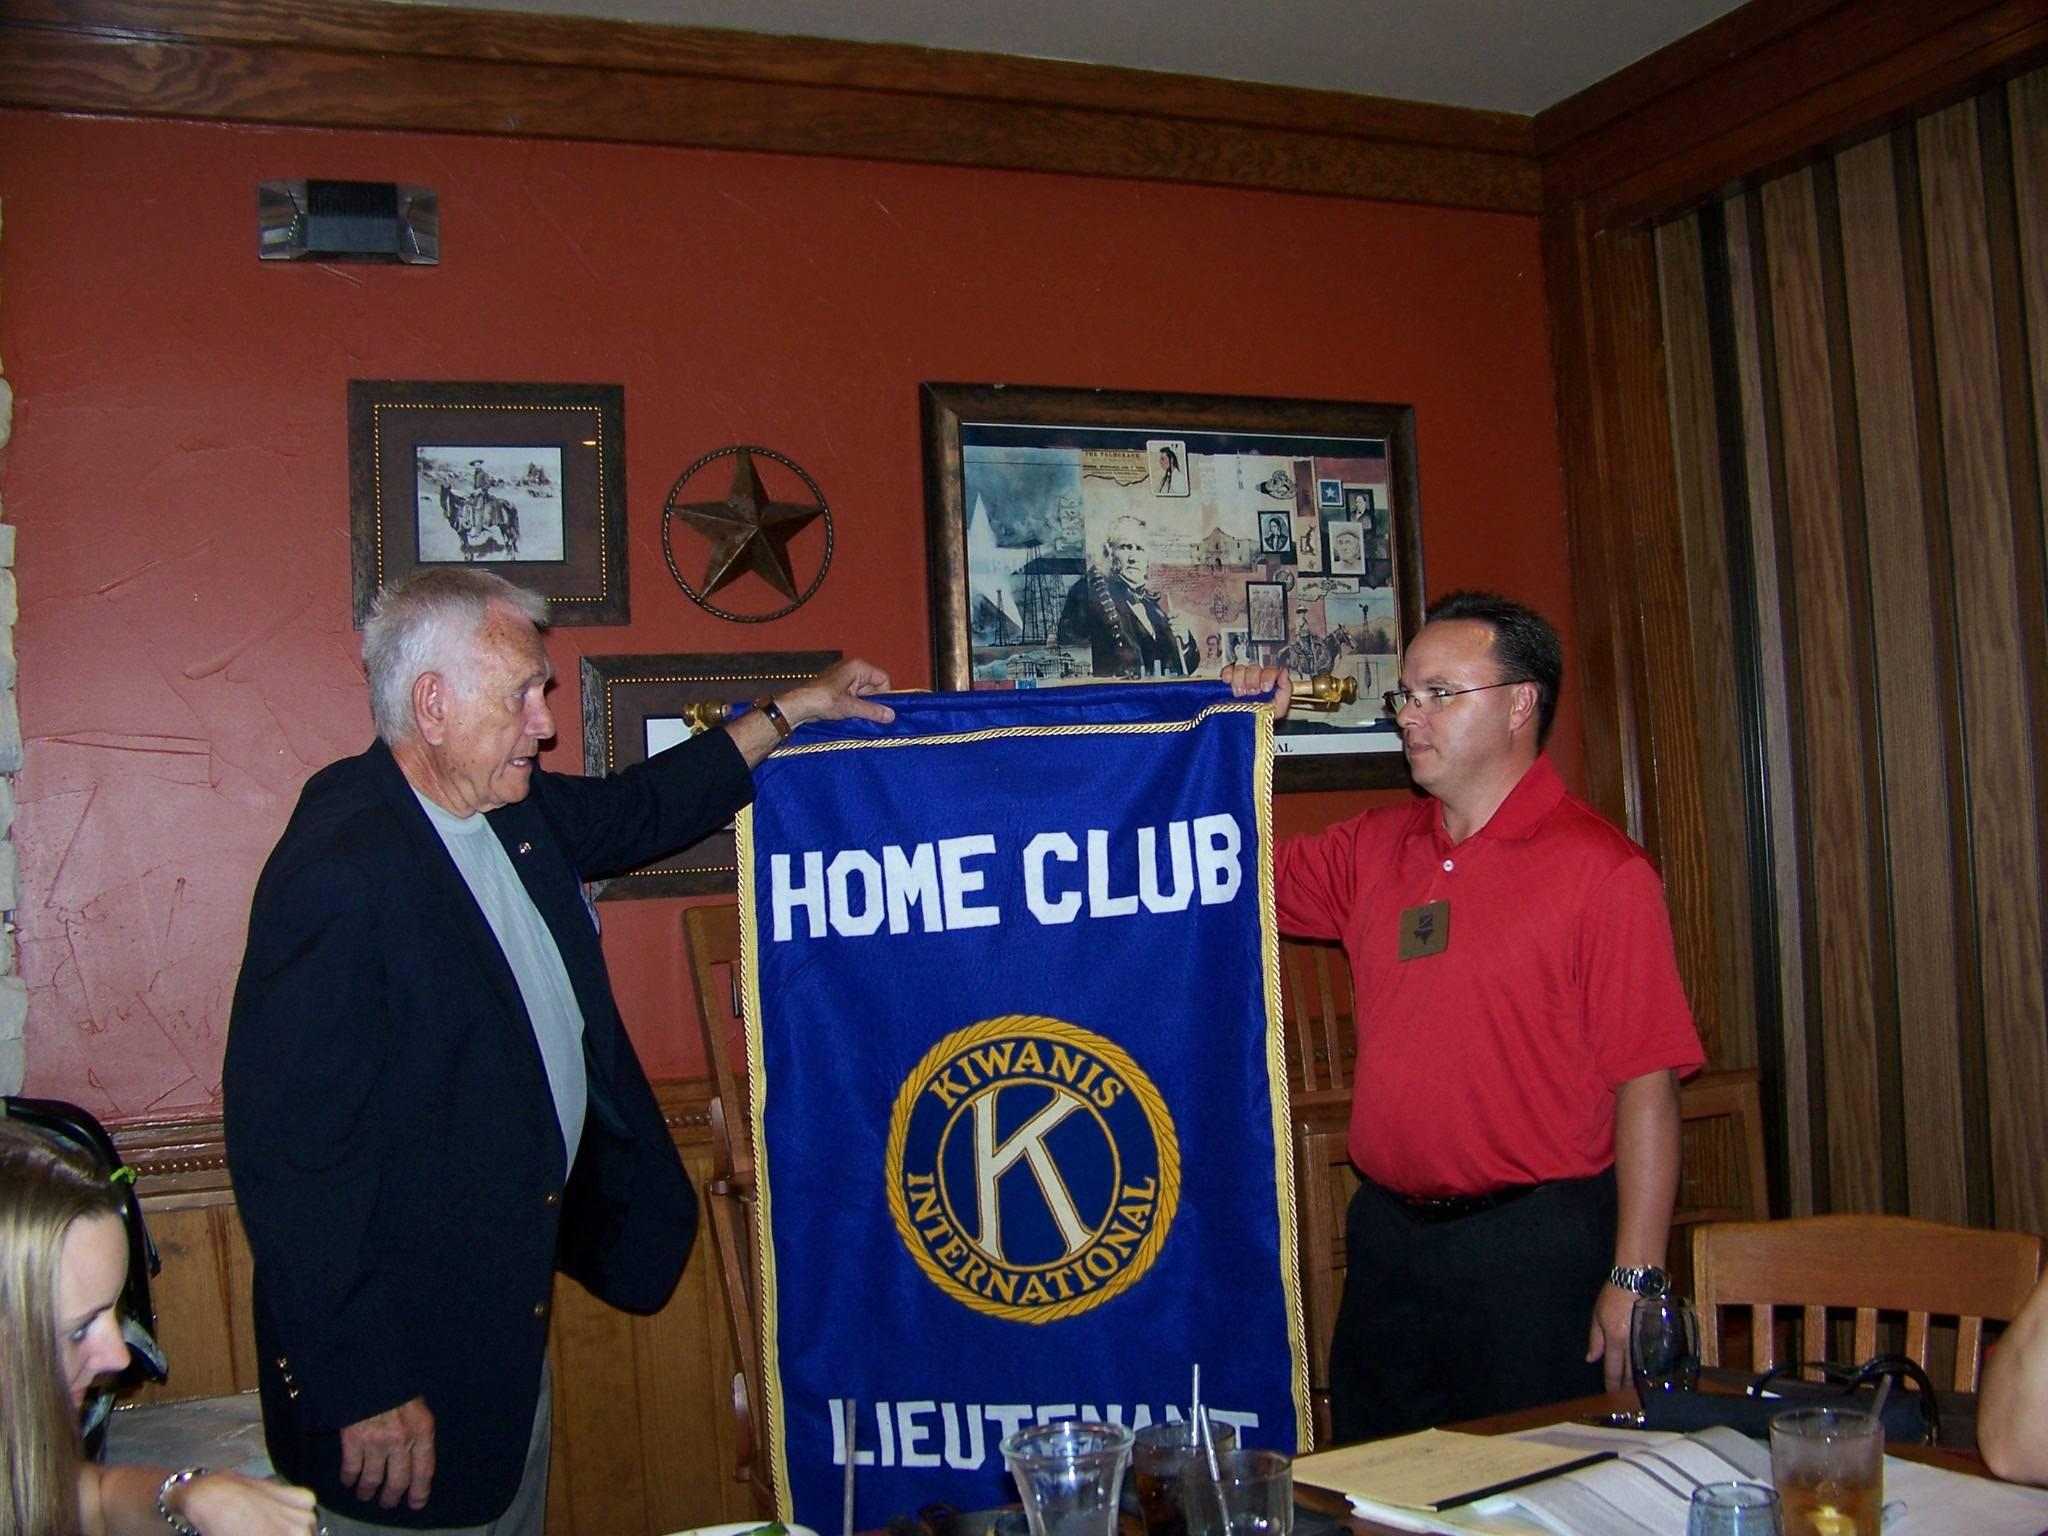 Bill Herron & Steven Kirkpatrick